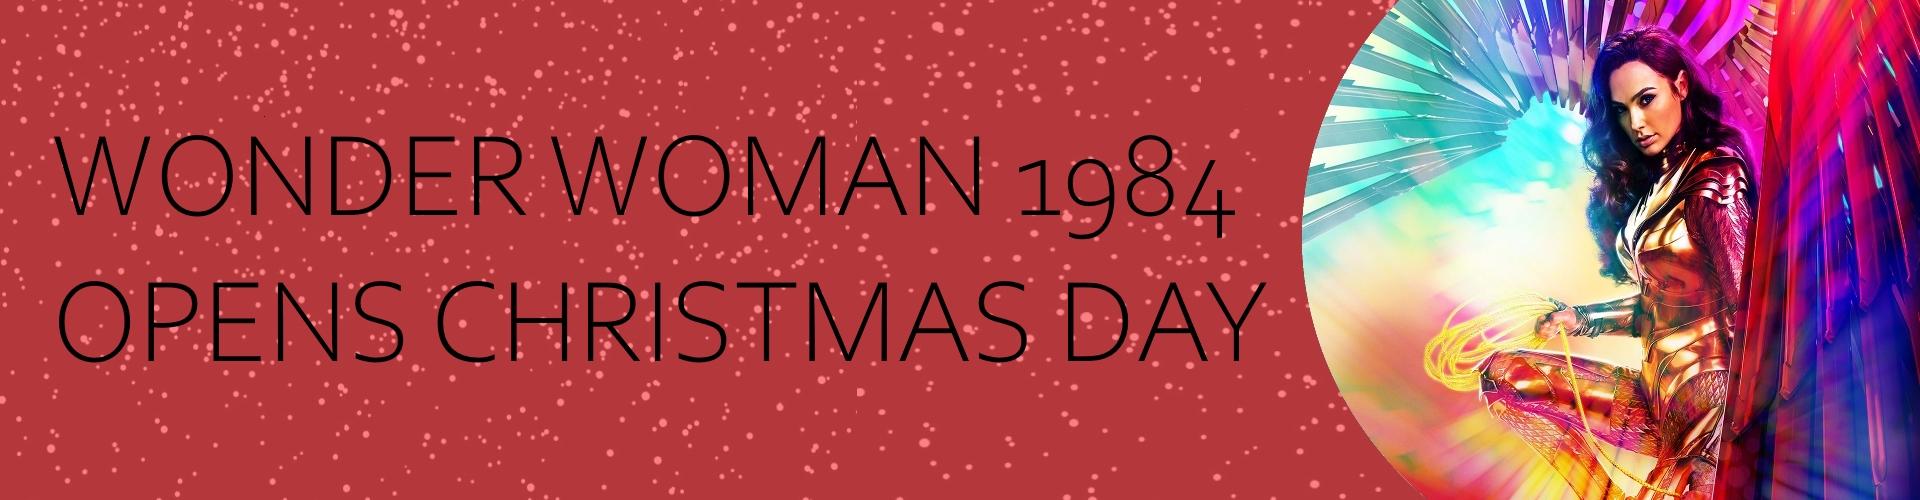 wonderwomanchristmas